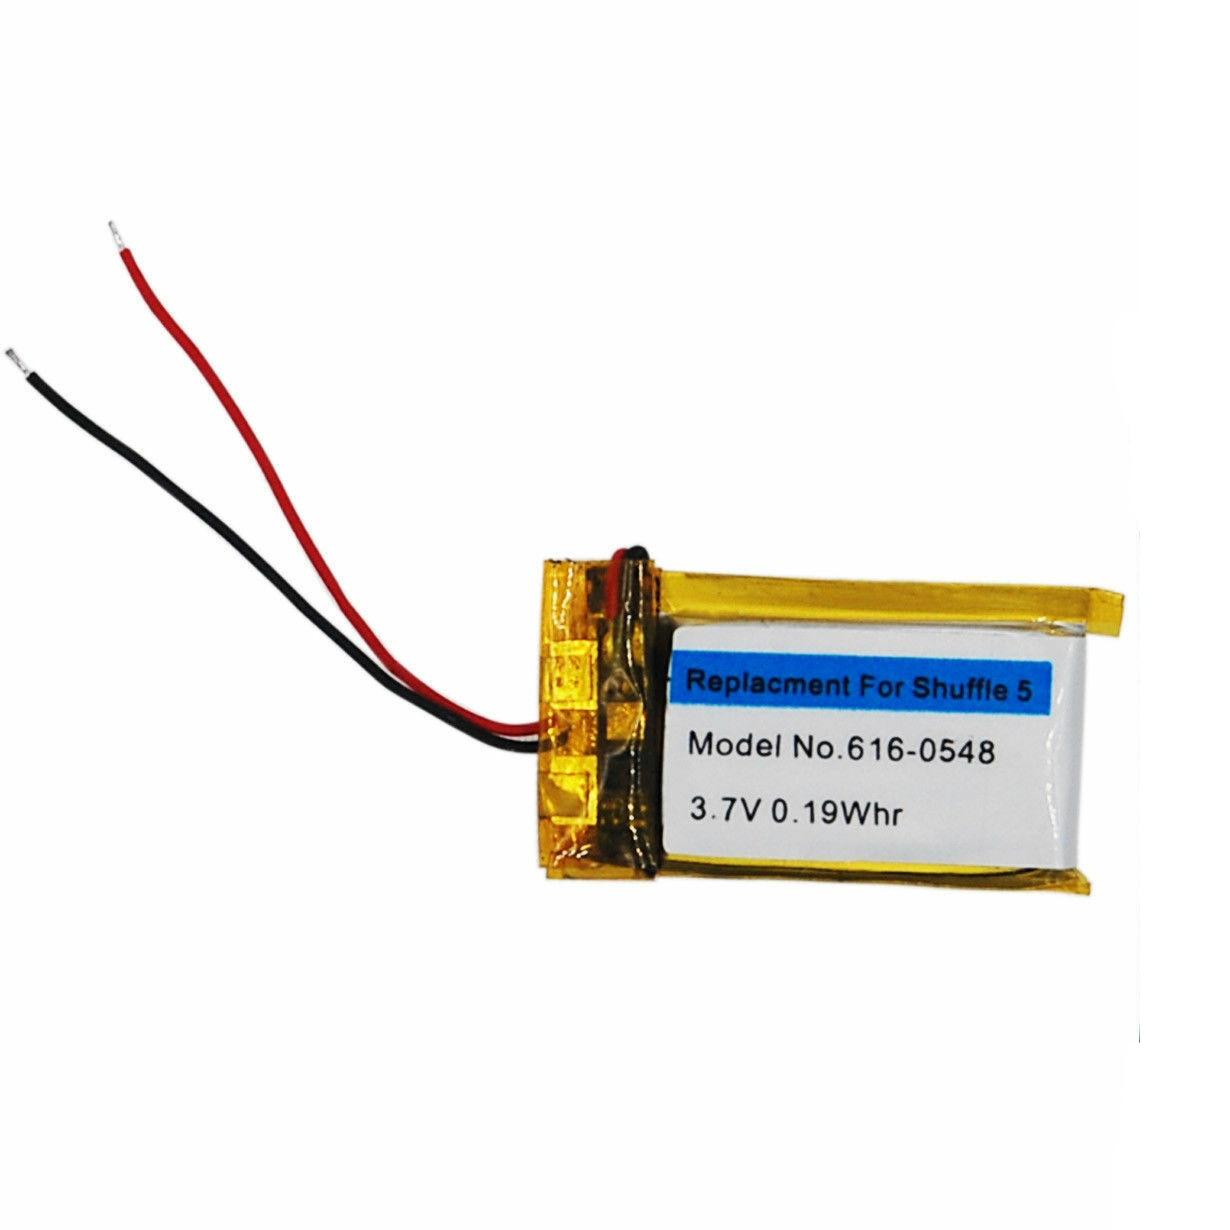 Replacement Internal Li-polymer Battery for iPod Shuffle 5 Generation(China)